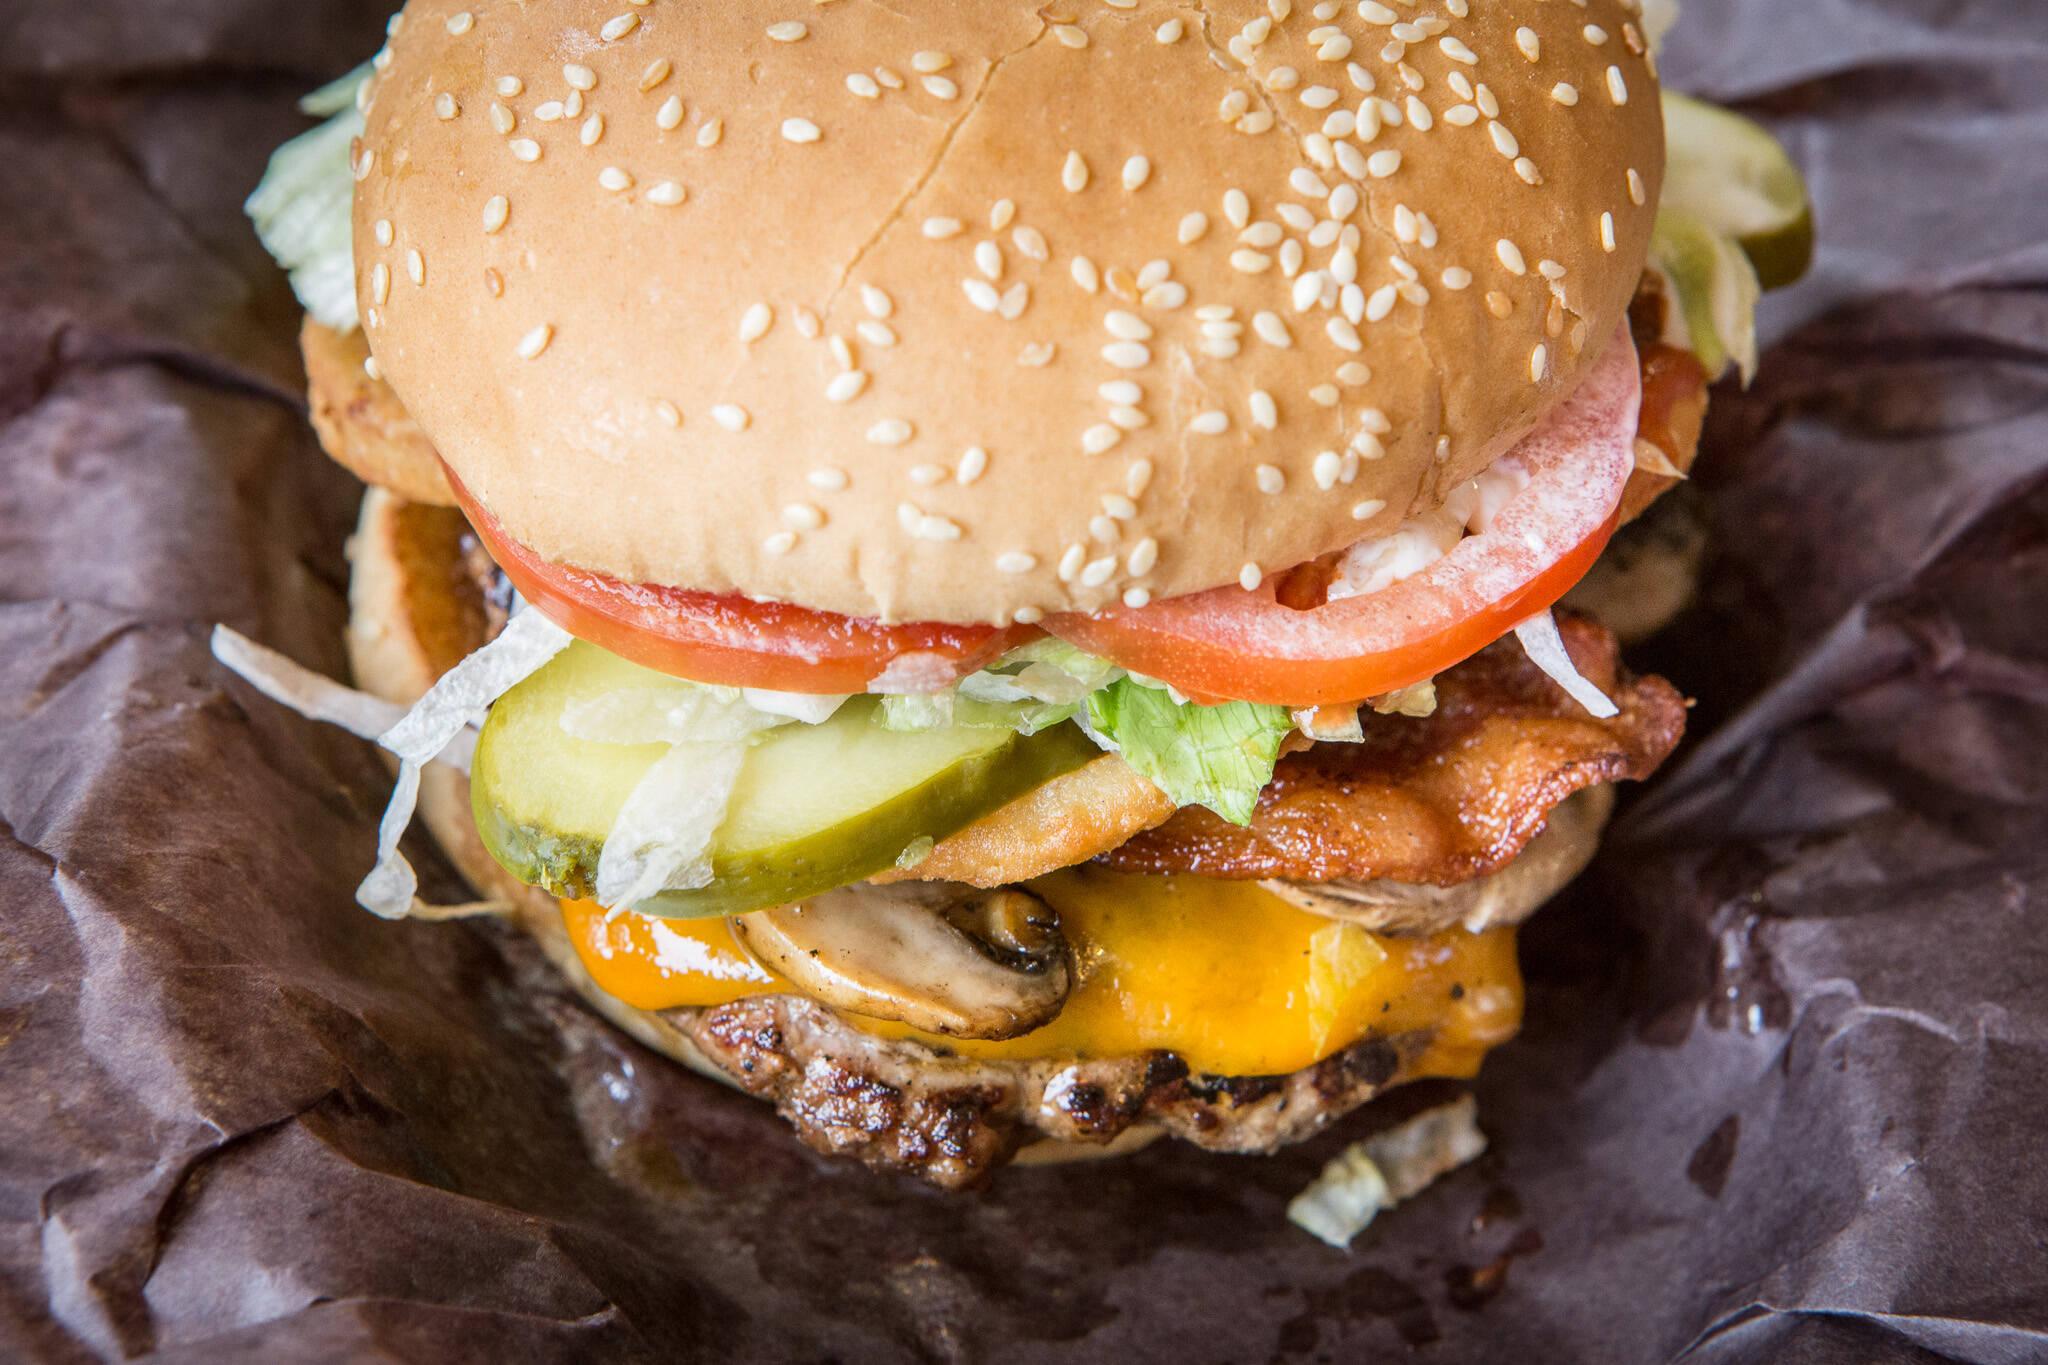 cheeseburger toronto